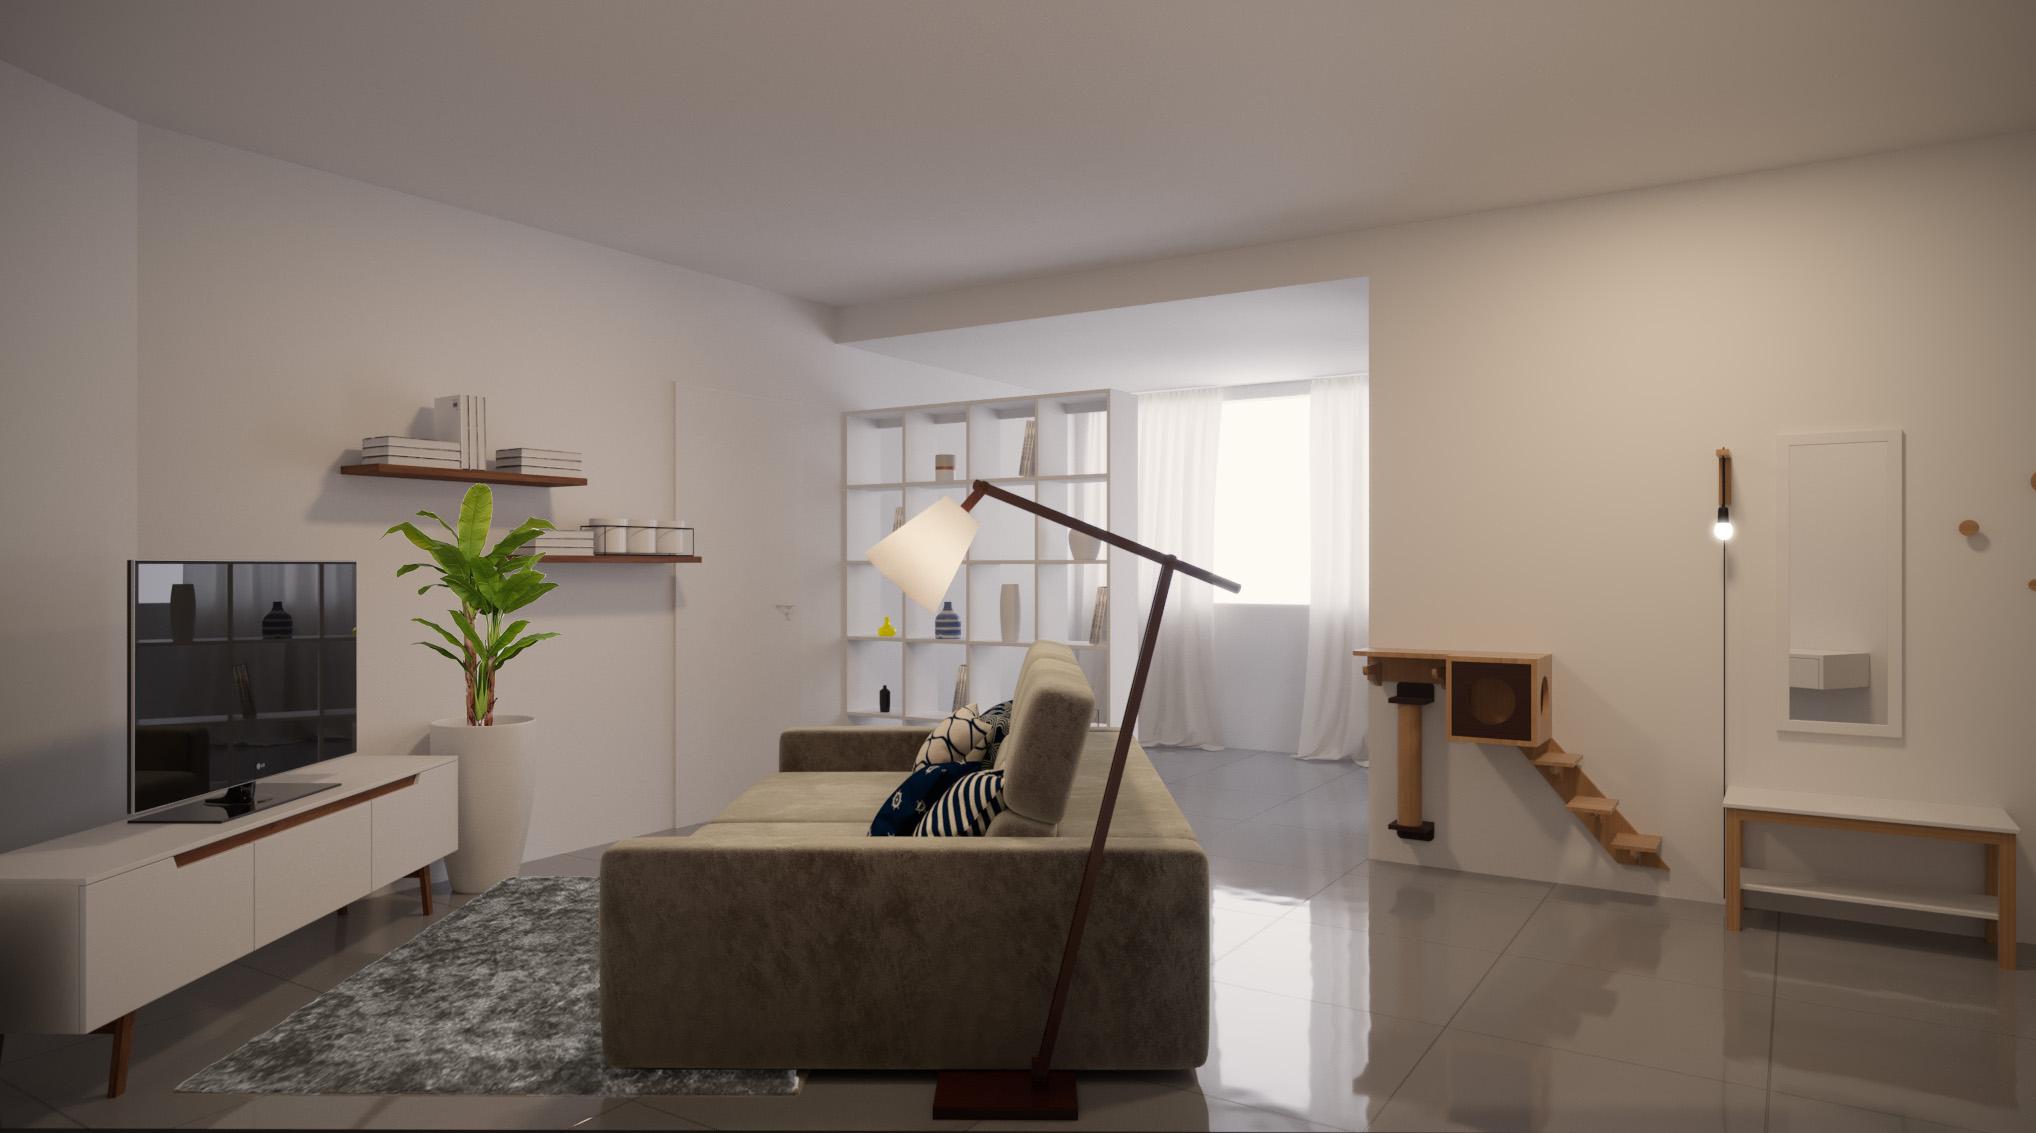 Sala de estar estilo Moderno sofisticado Divertido